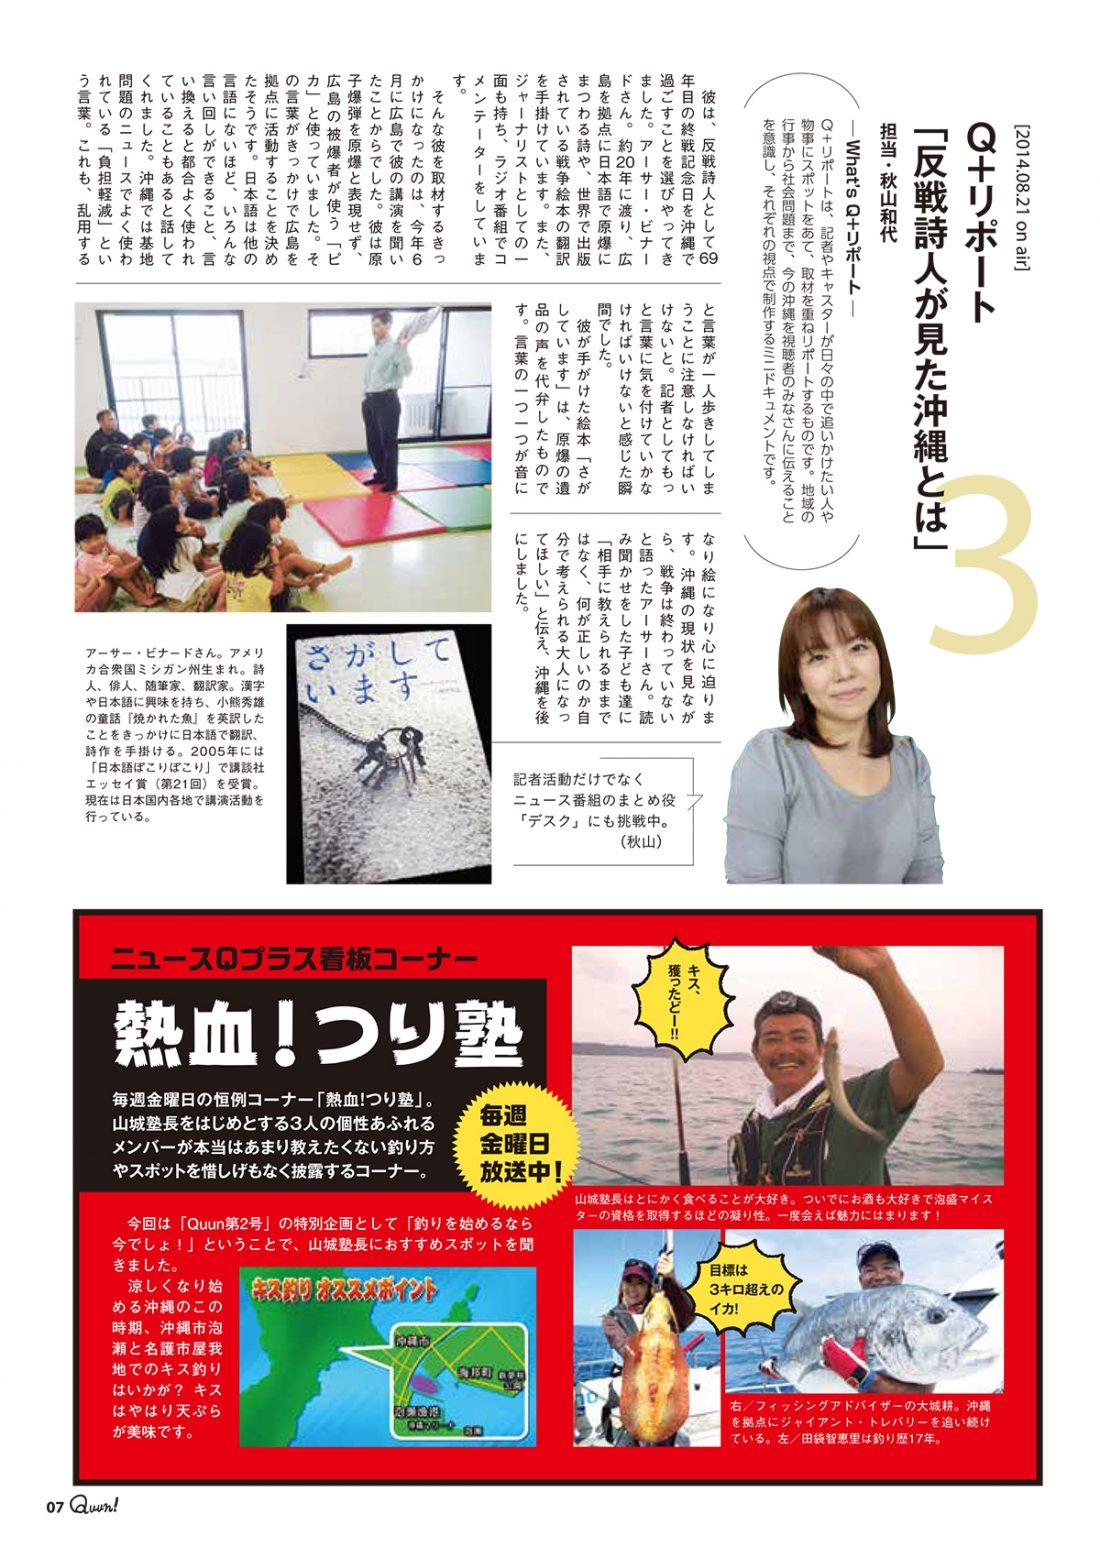 https://www.qab.co.jp/qgoro/wp-content/uploads/quun_0209-1100x1558.jpg